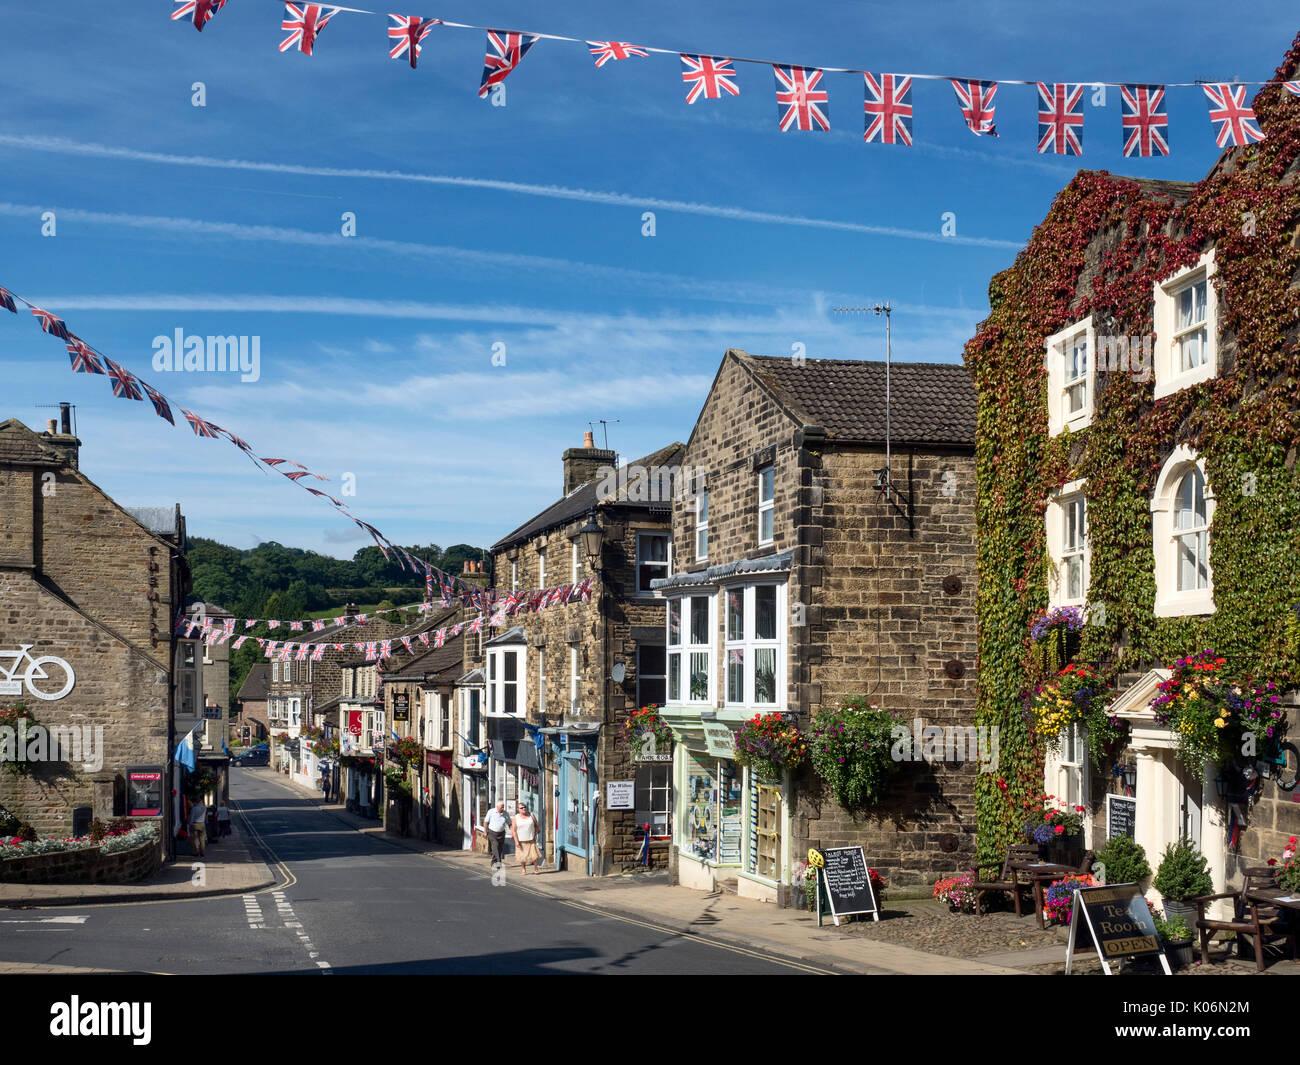 Union Jack Bunting over the High Street at Pateley Bridge Nidderdale AONB Yorkshire England - Stock Image